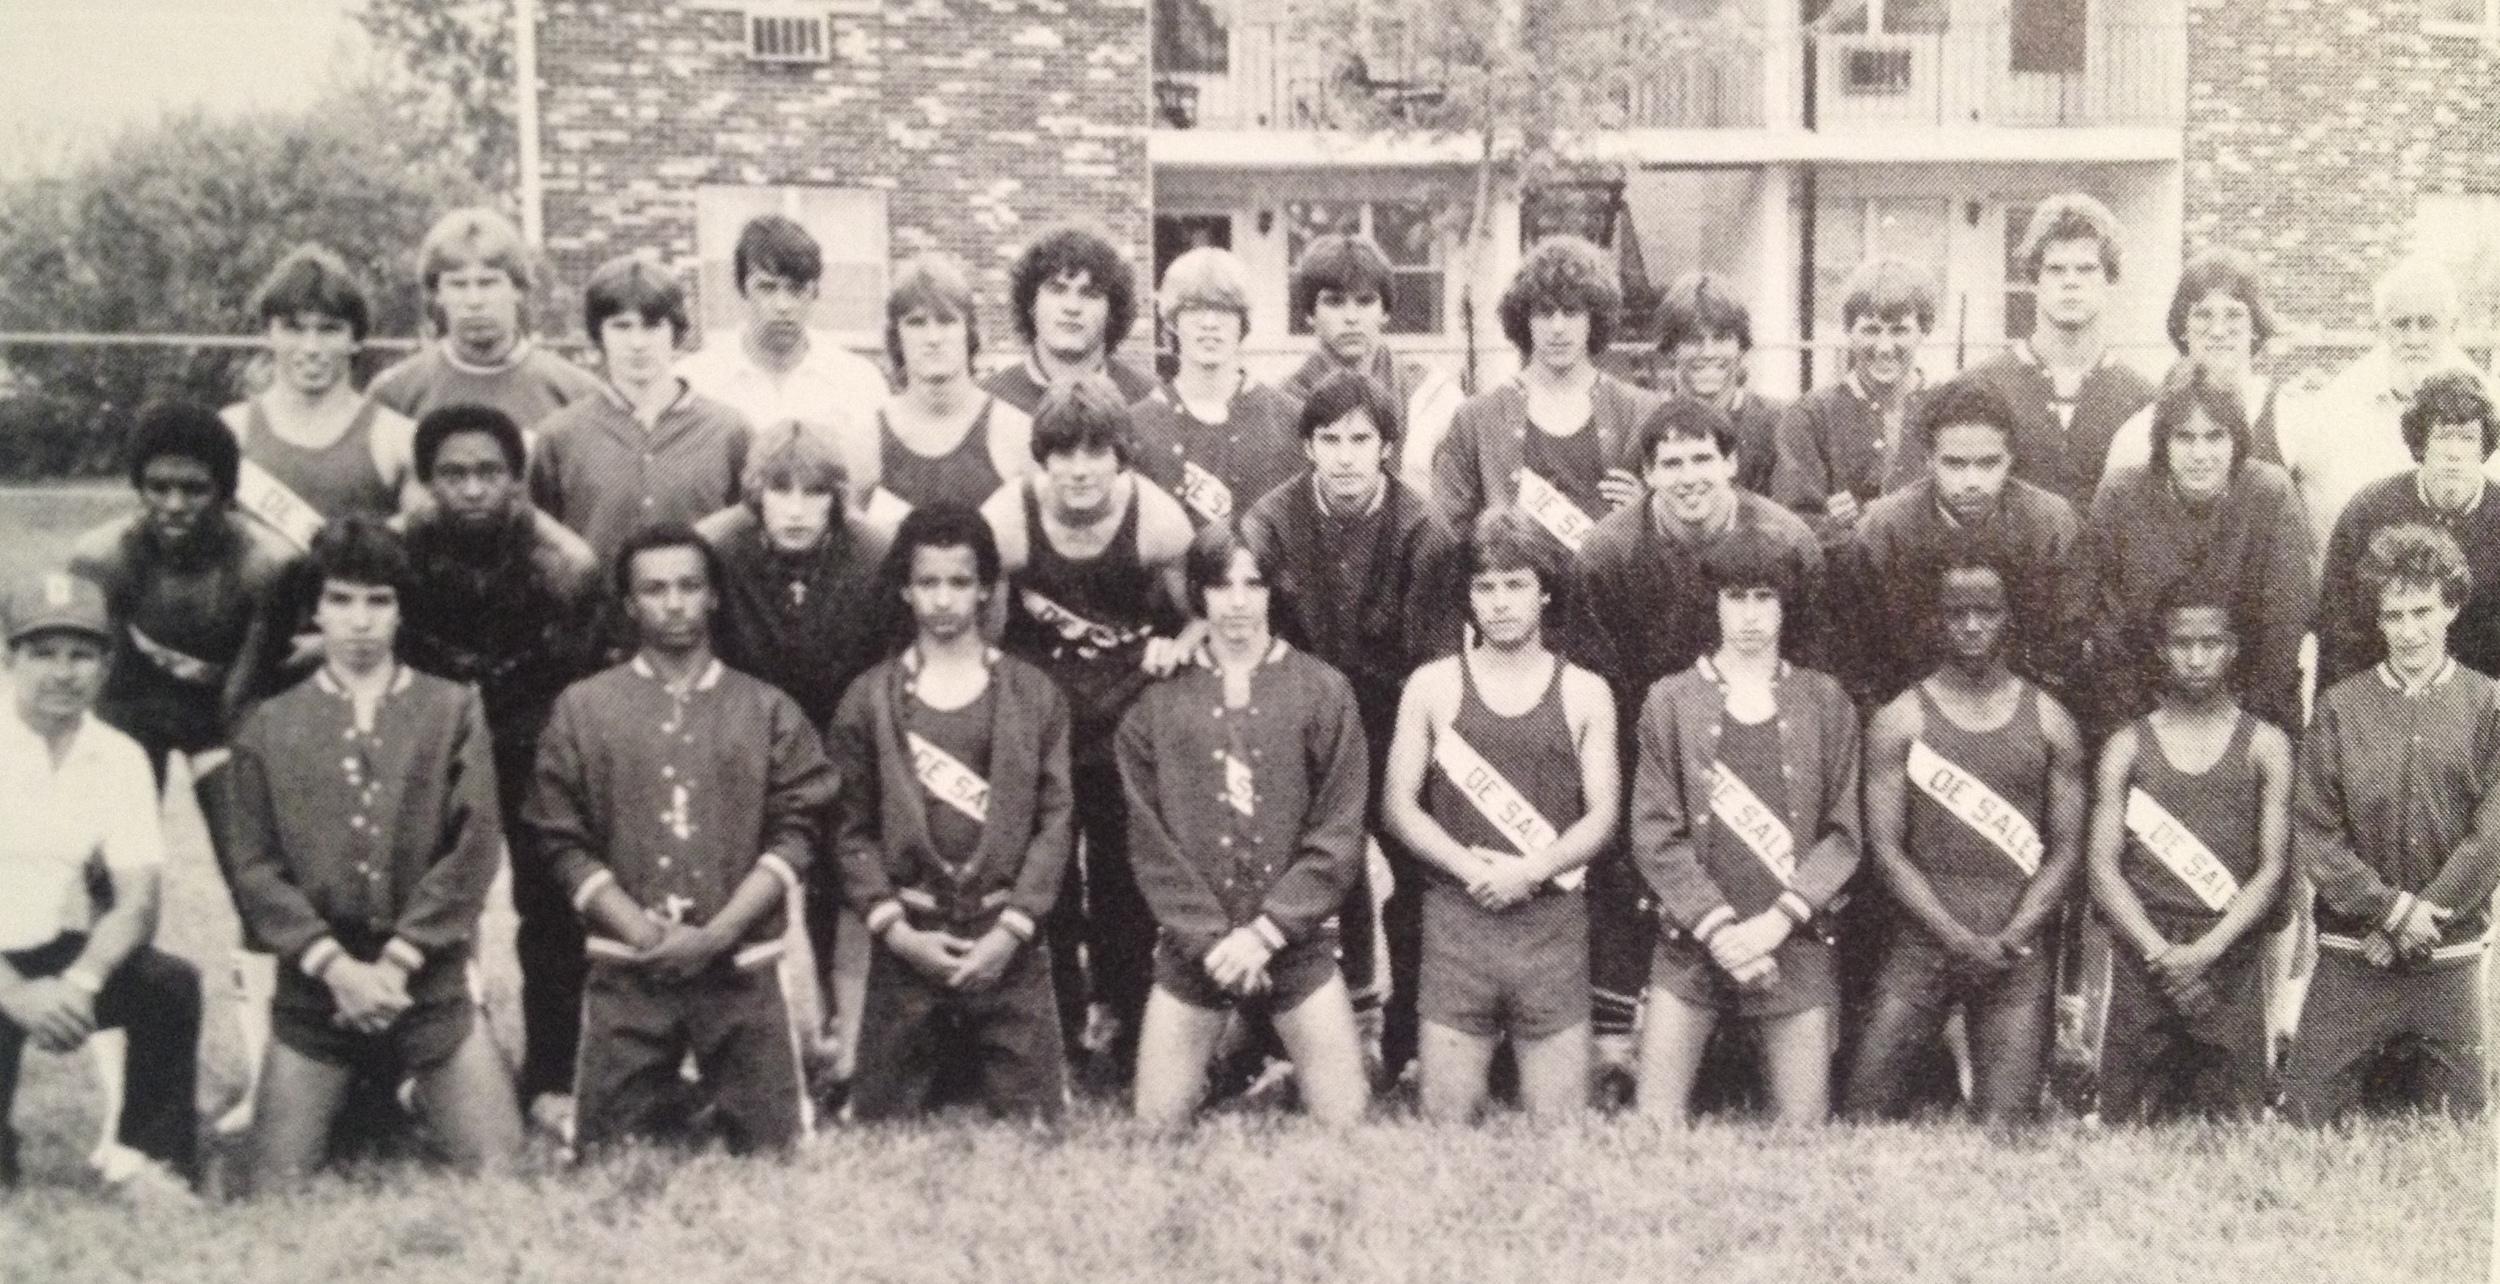 1981 District Champions